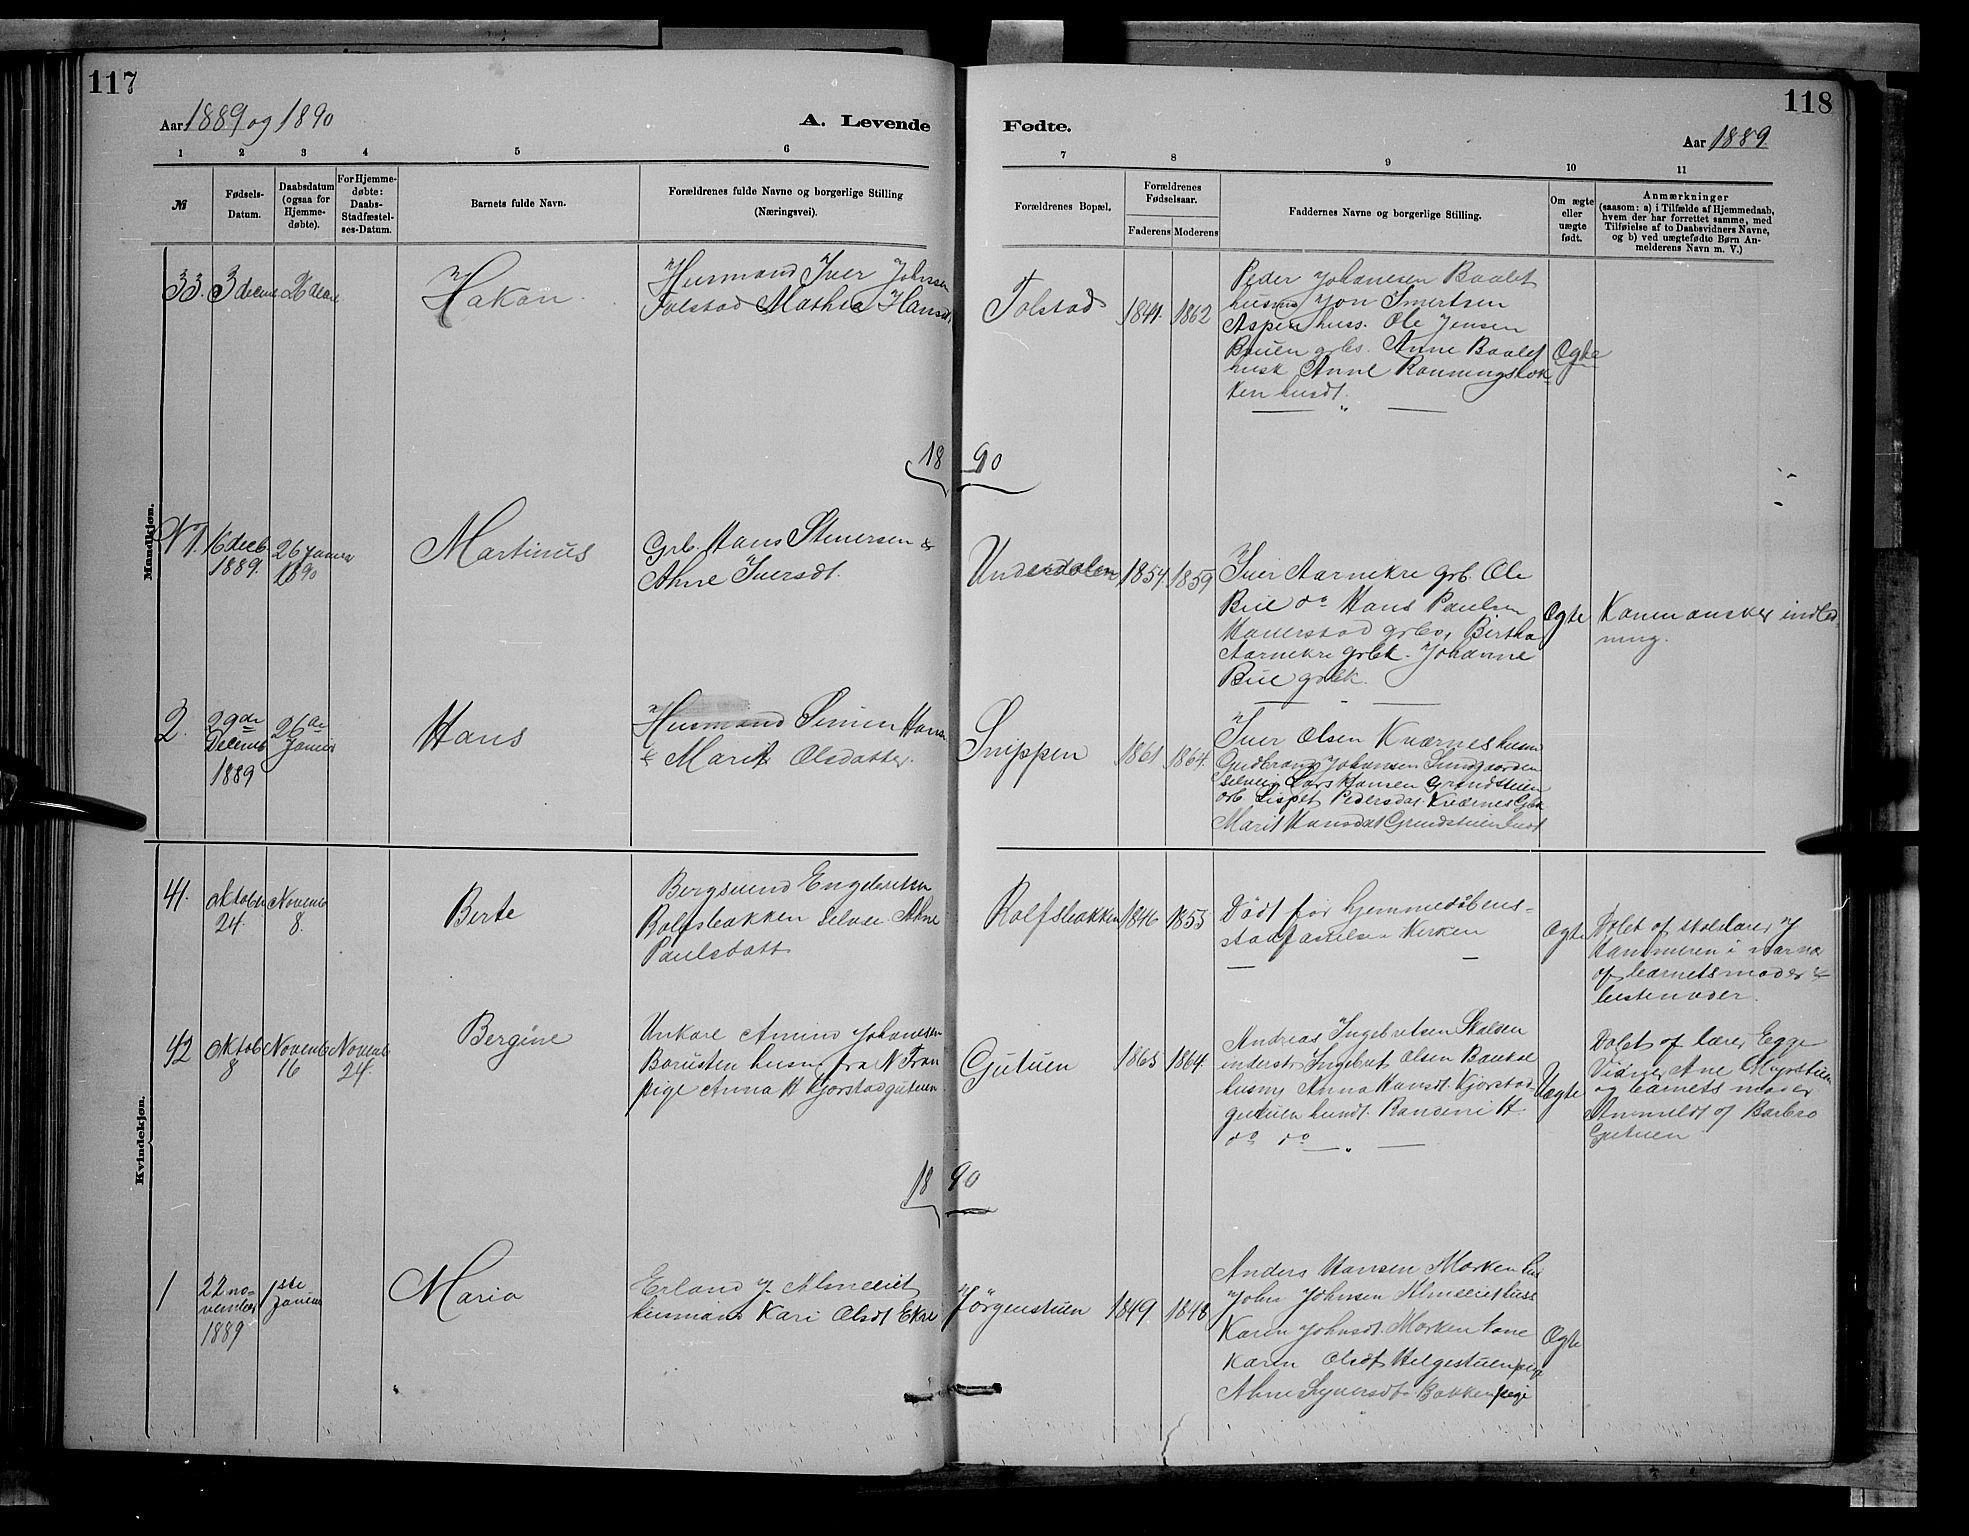 SAH, Sør-Fron prestekontor, H/Ha/Hab/L0003: Klokkerbok nr. 3, 1884-1896, s. 117-118